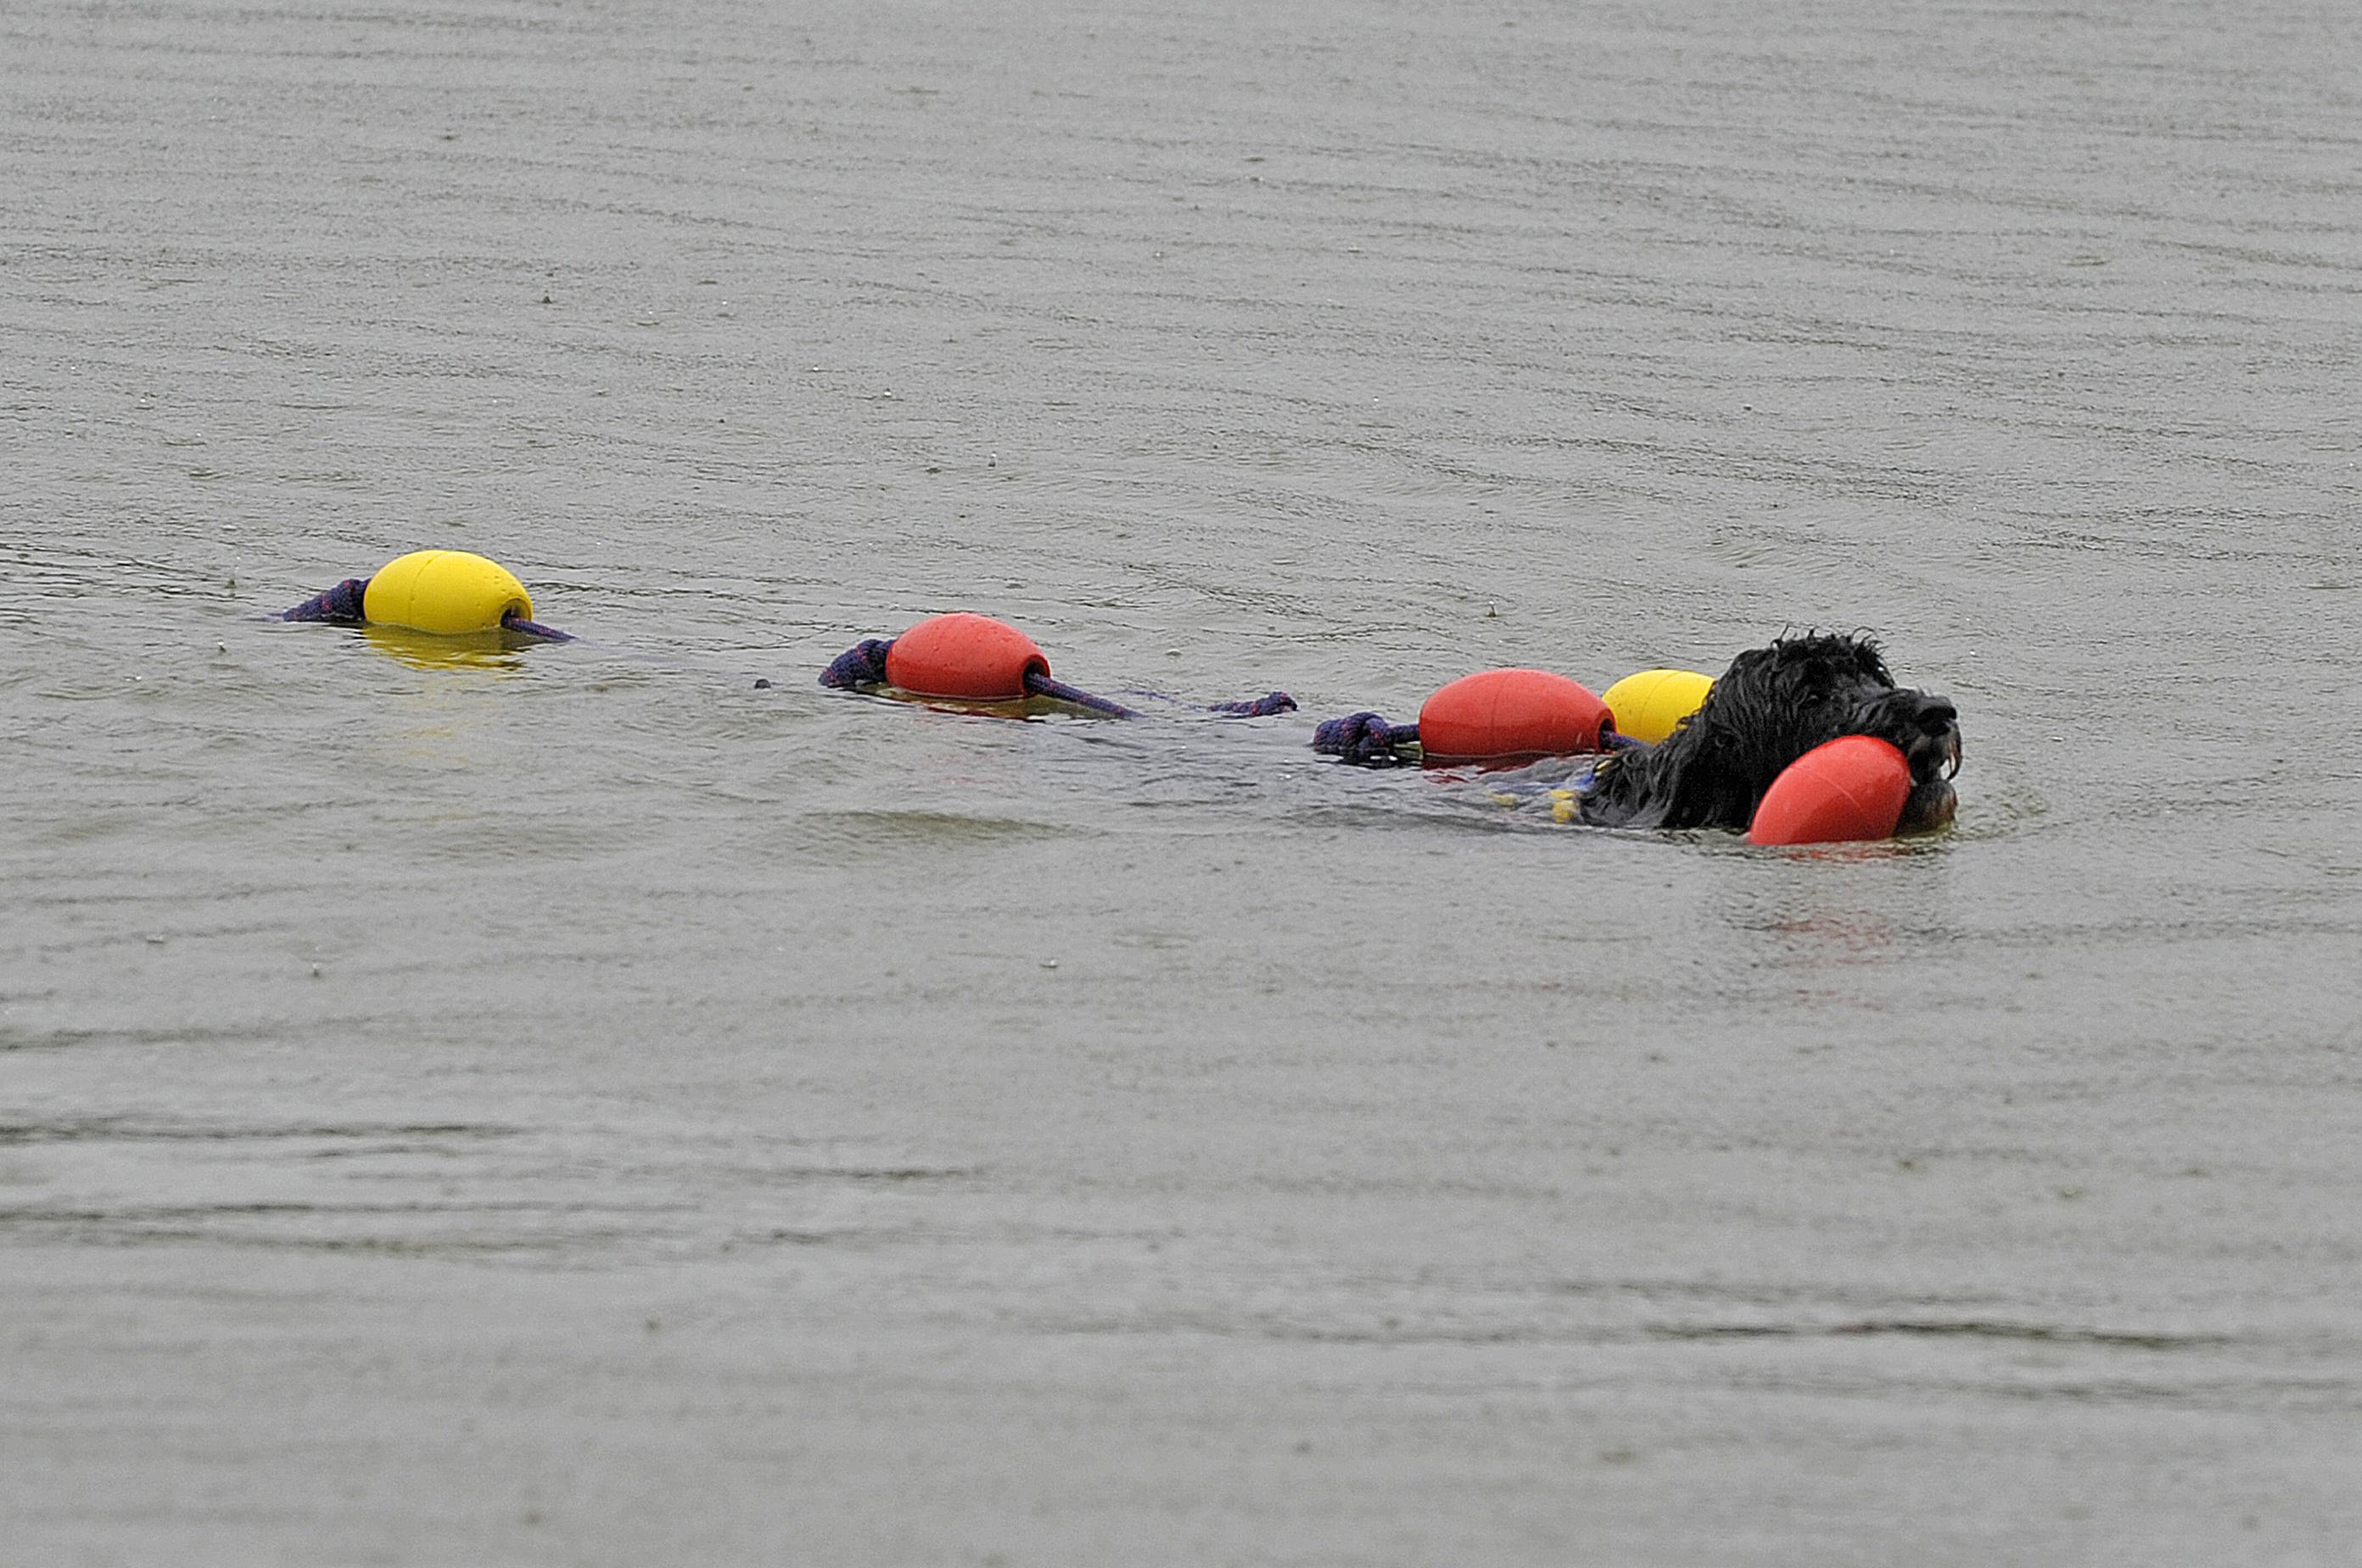 Jade retrieving her float line